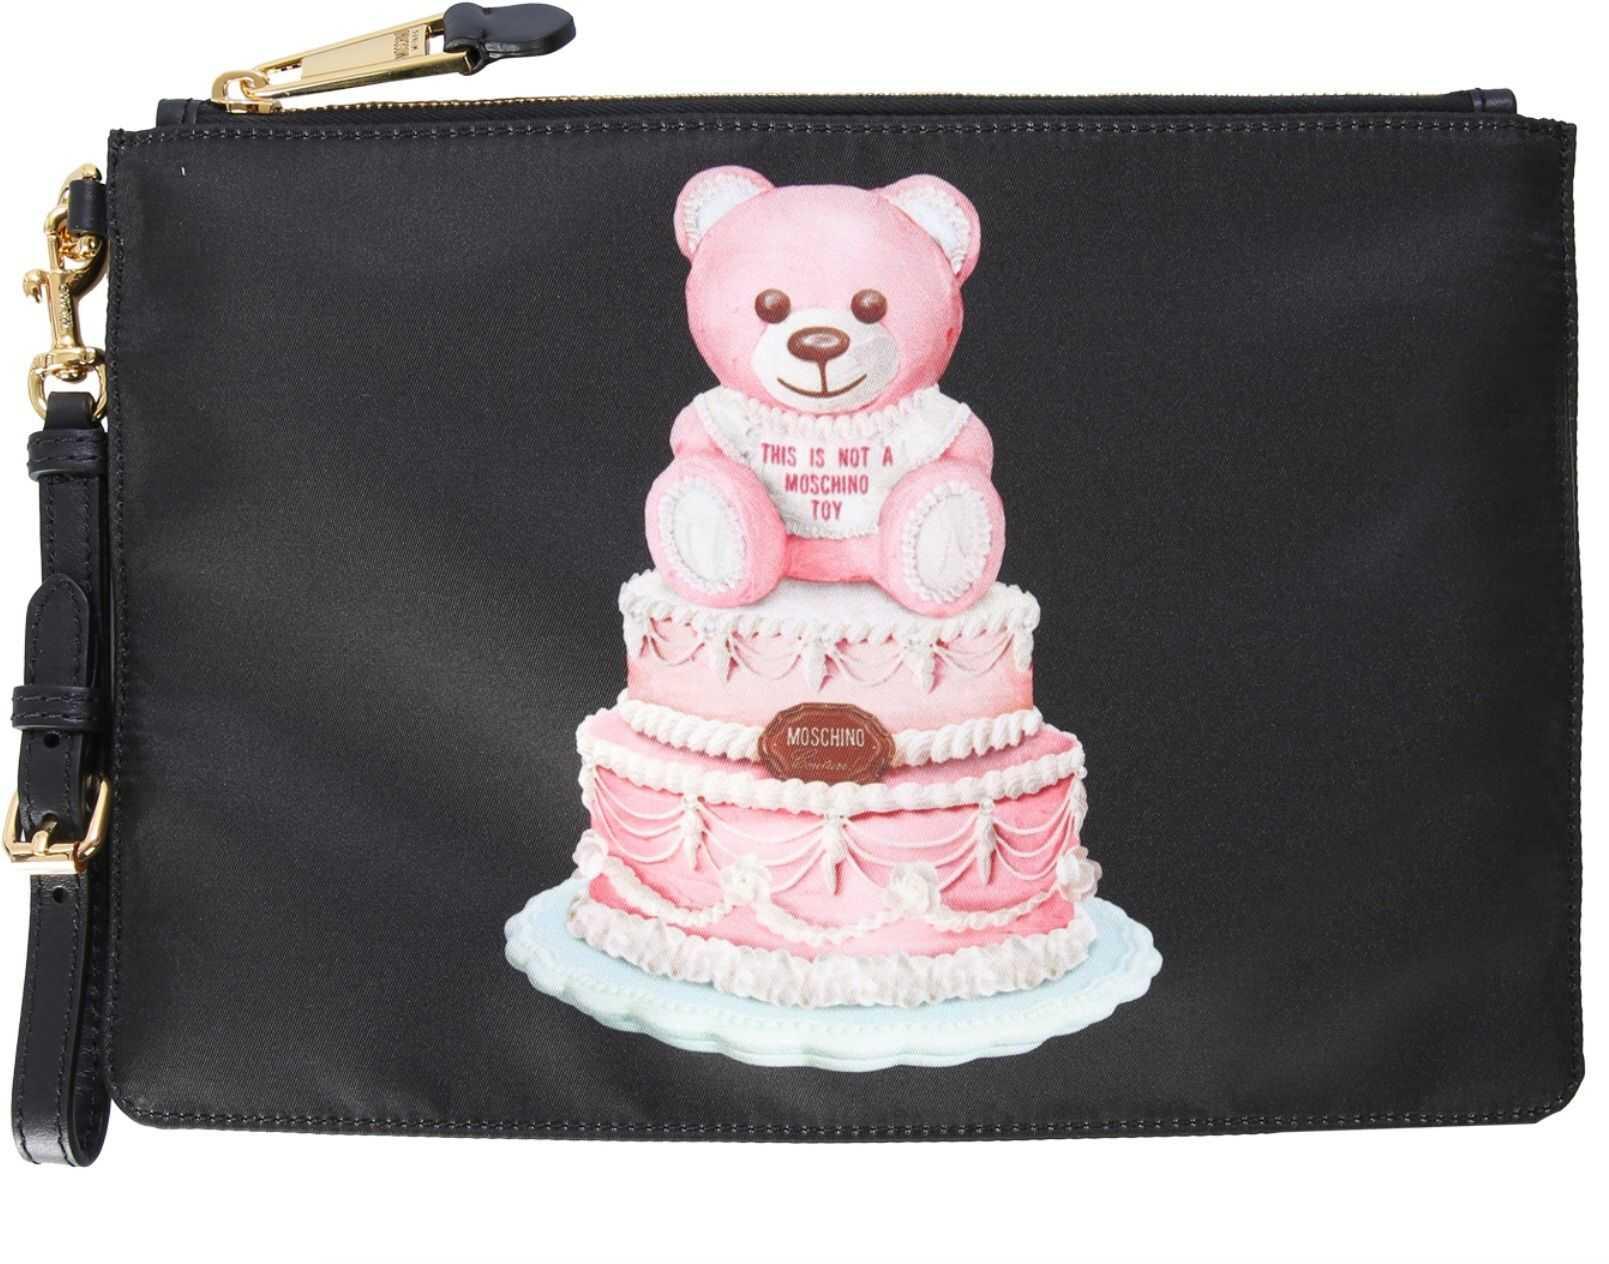 "Moschino ""Teddy Cake"" Pouch 84448213_1555 BLACK imagine b-mall.ro"